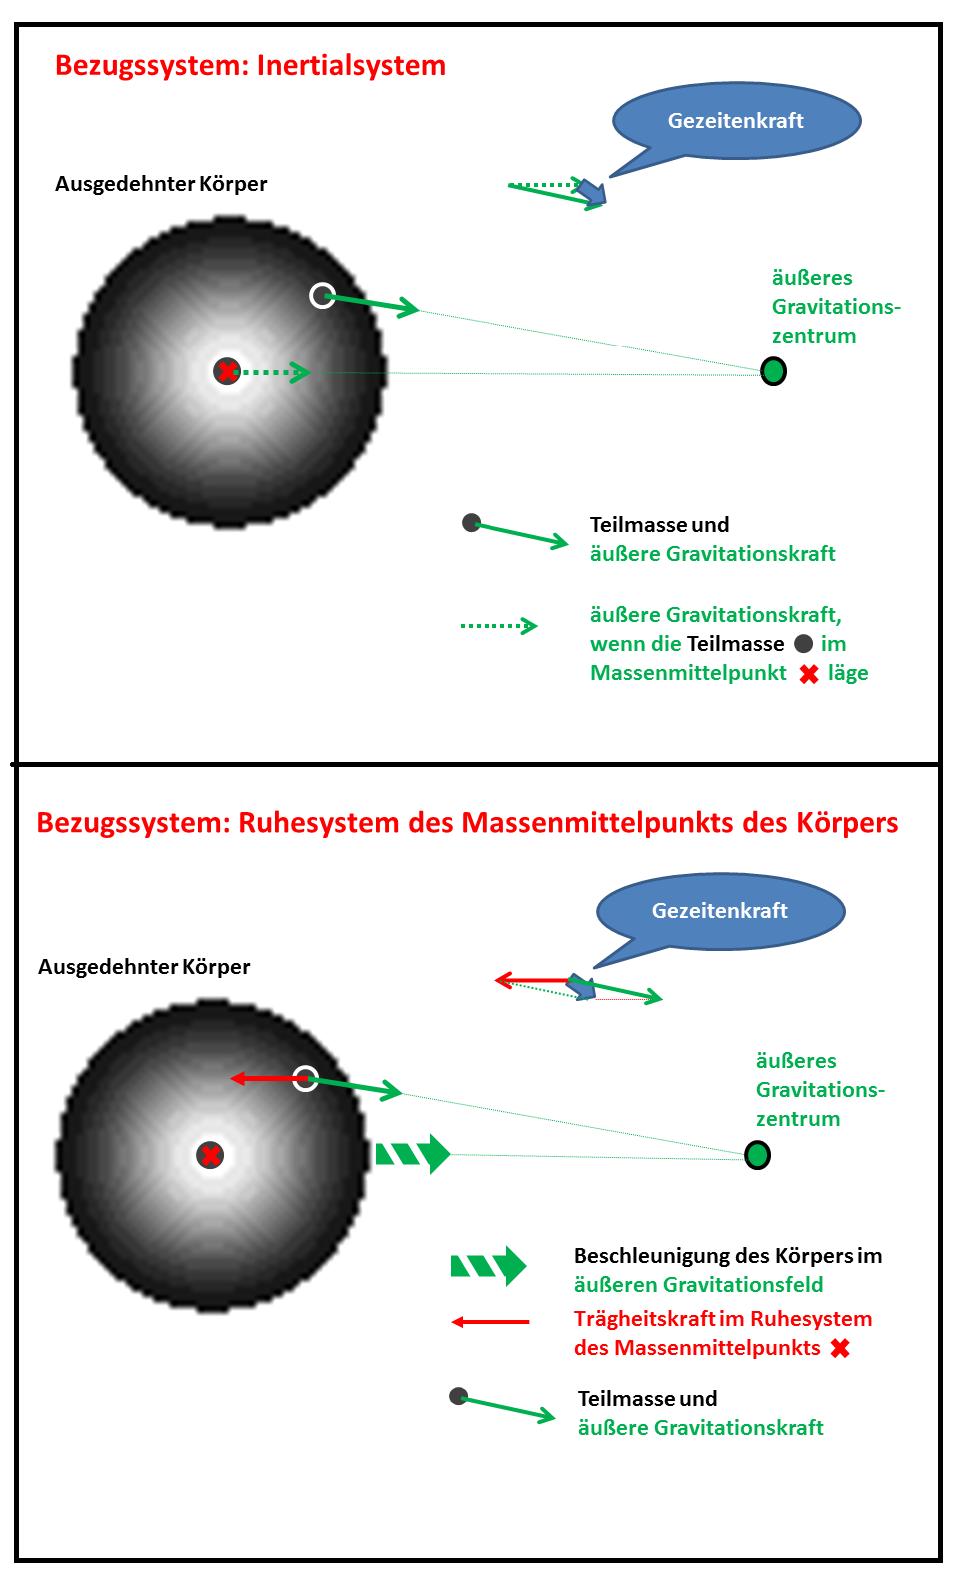 Datei:Gezeitenkraft Inertialsystem Koerpersystem.png – Wikipedia